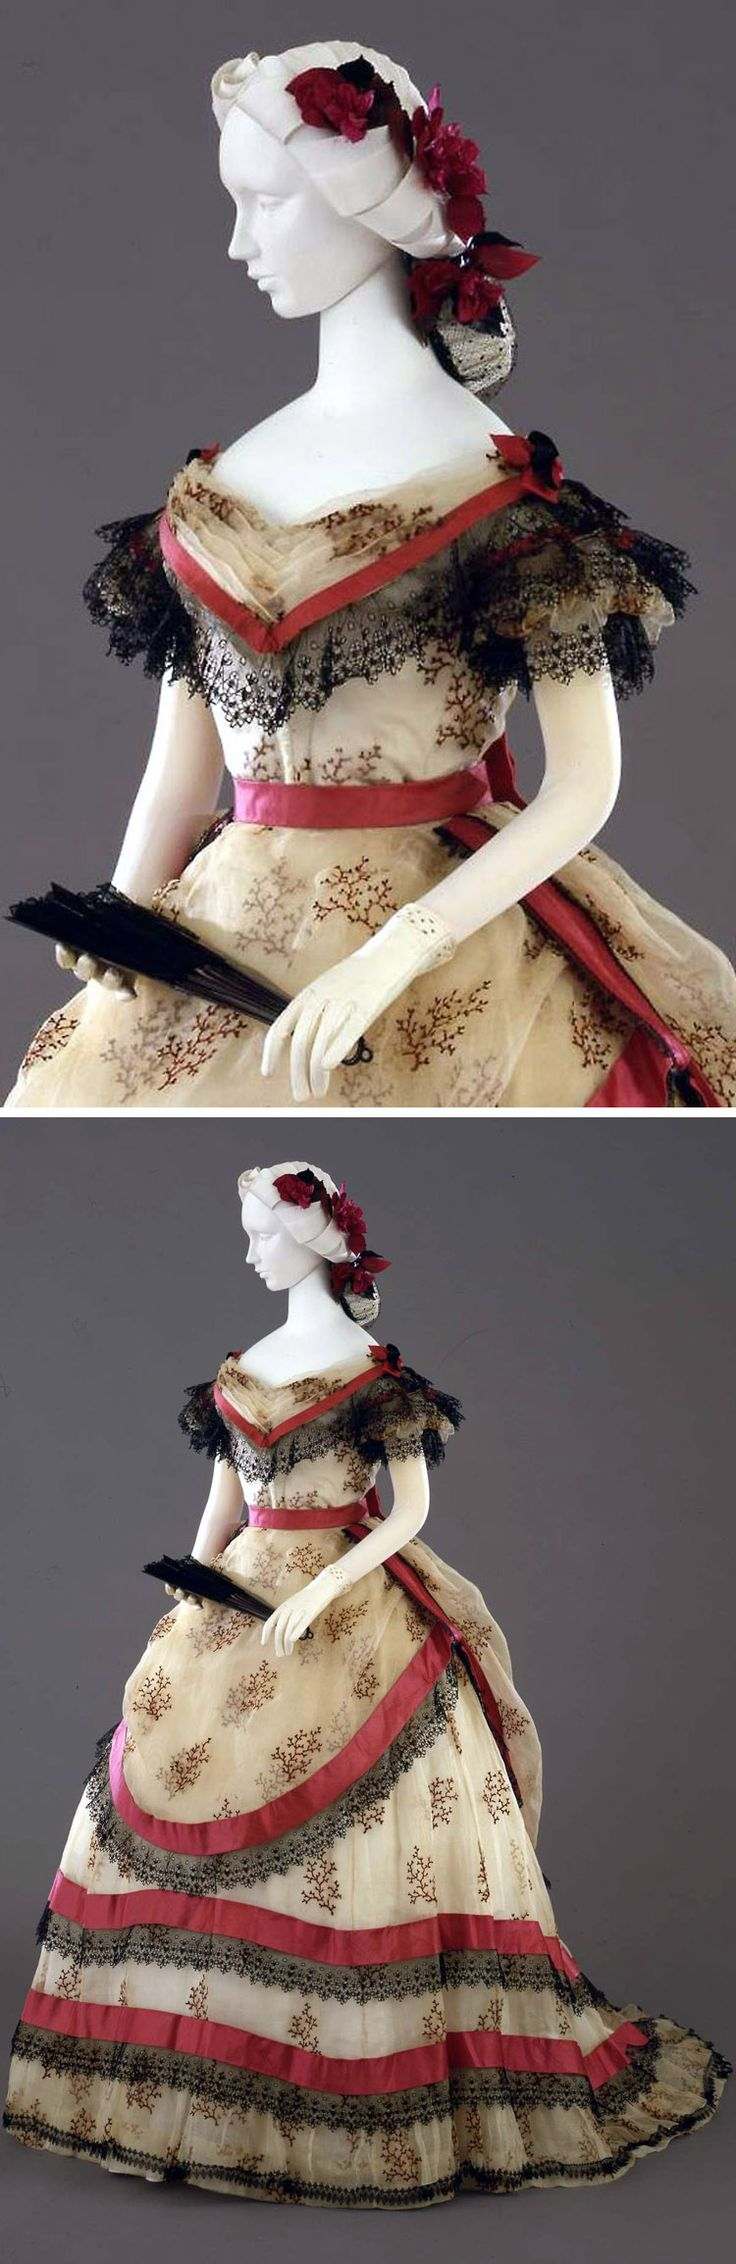 Ball gown, Italian (?), ca. 1869. Ivory-colored linen, with printed coral branches, bordered in red satin and black lace. Photo: Antonio Quattrone. Collection Galleria del Costume di Palazzo Pitti